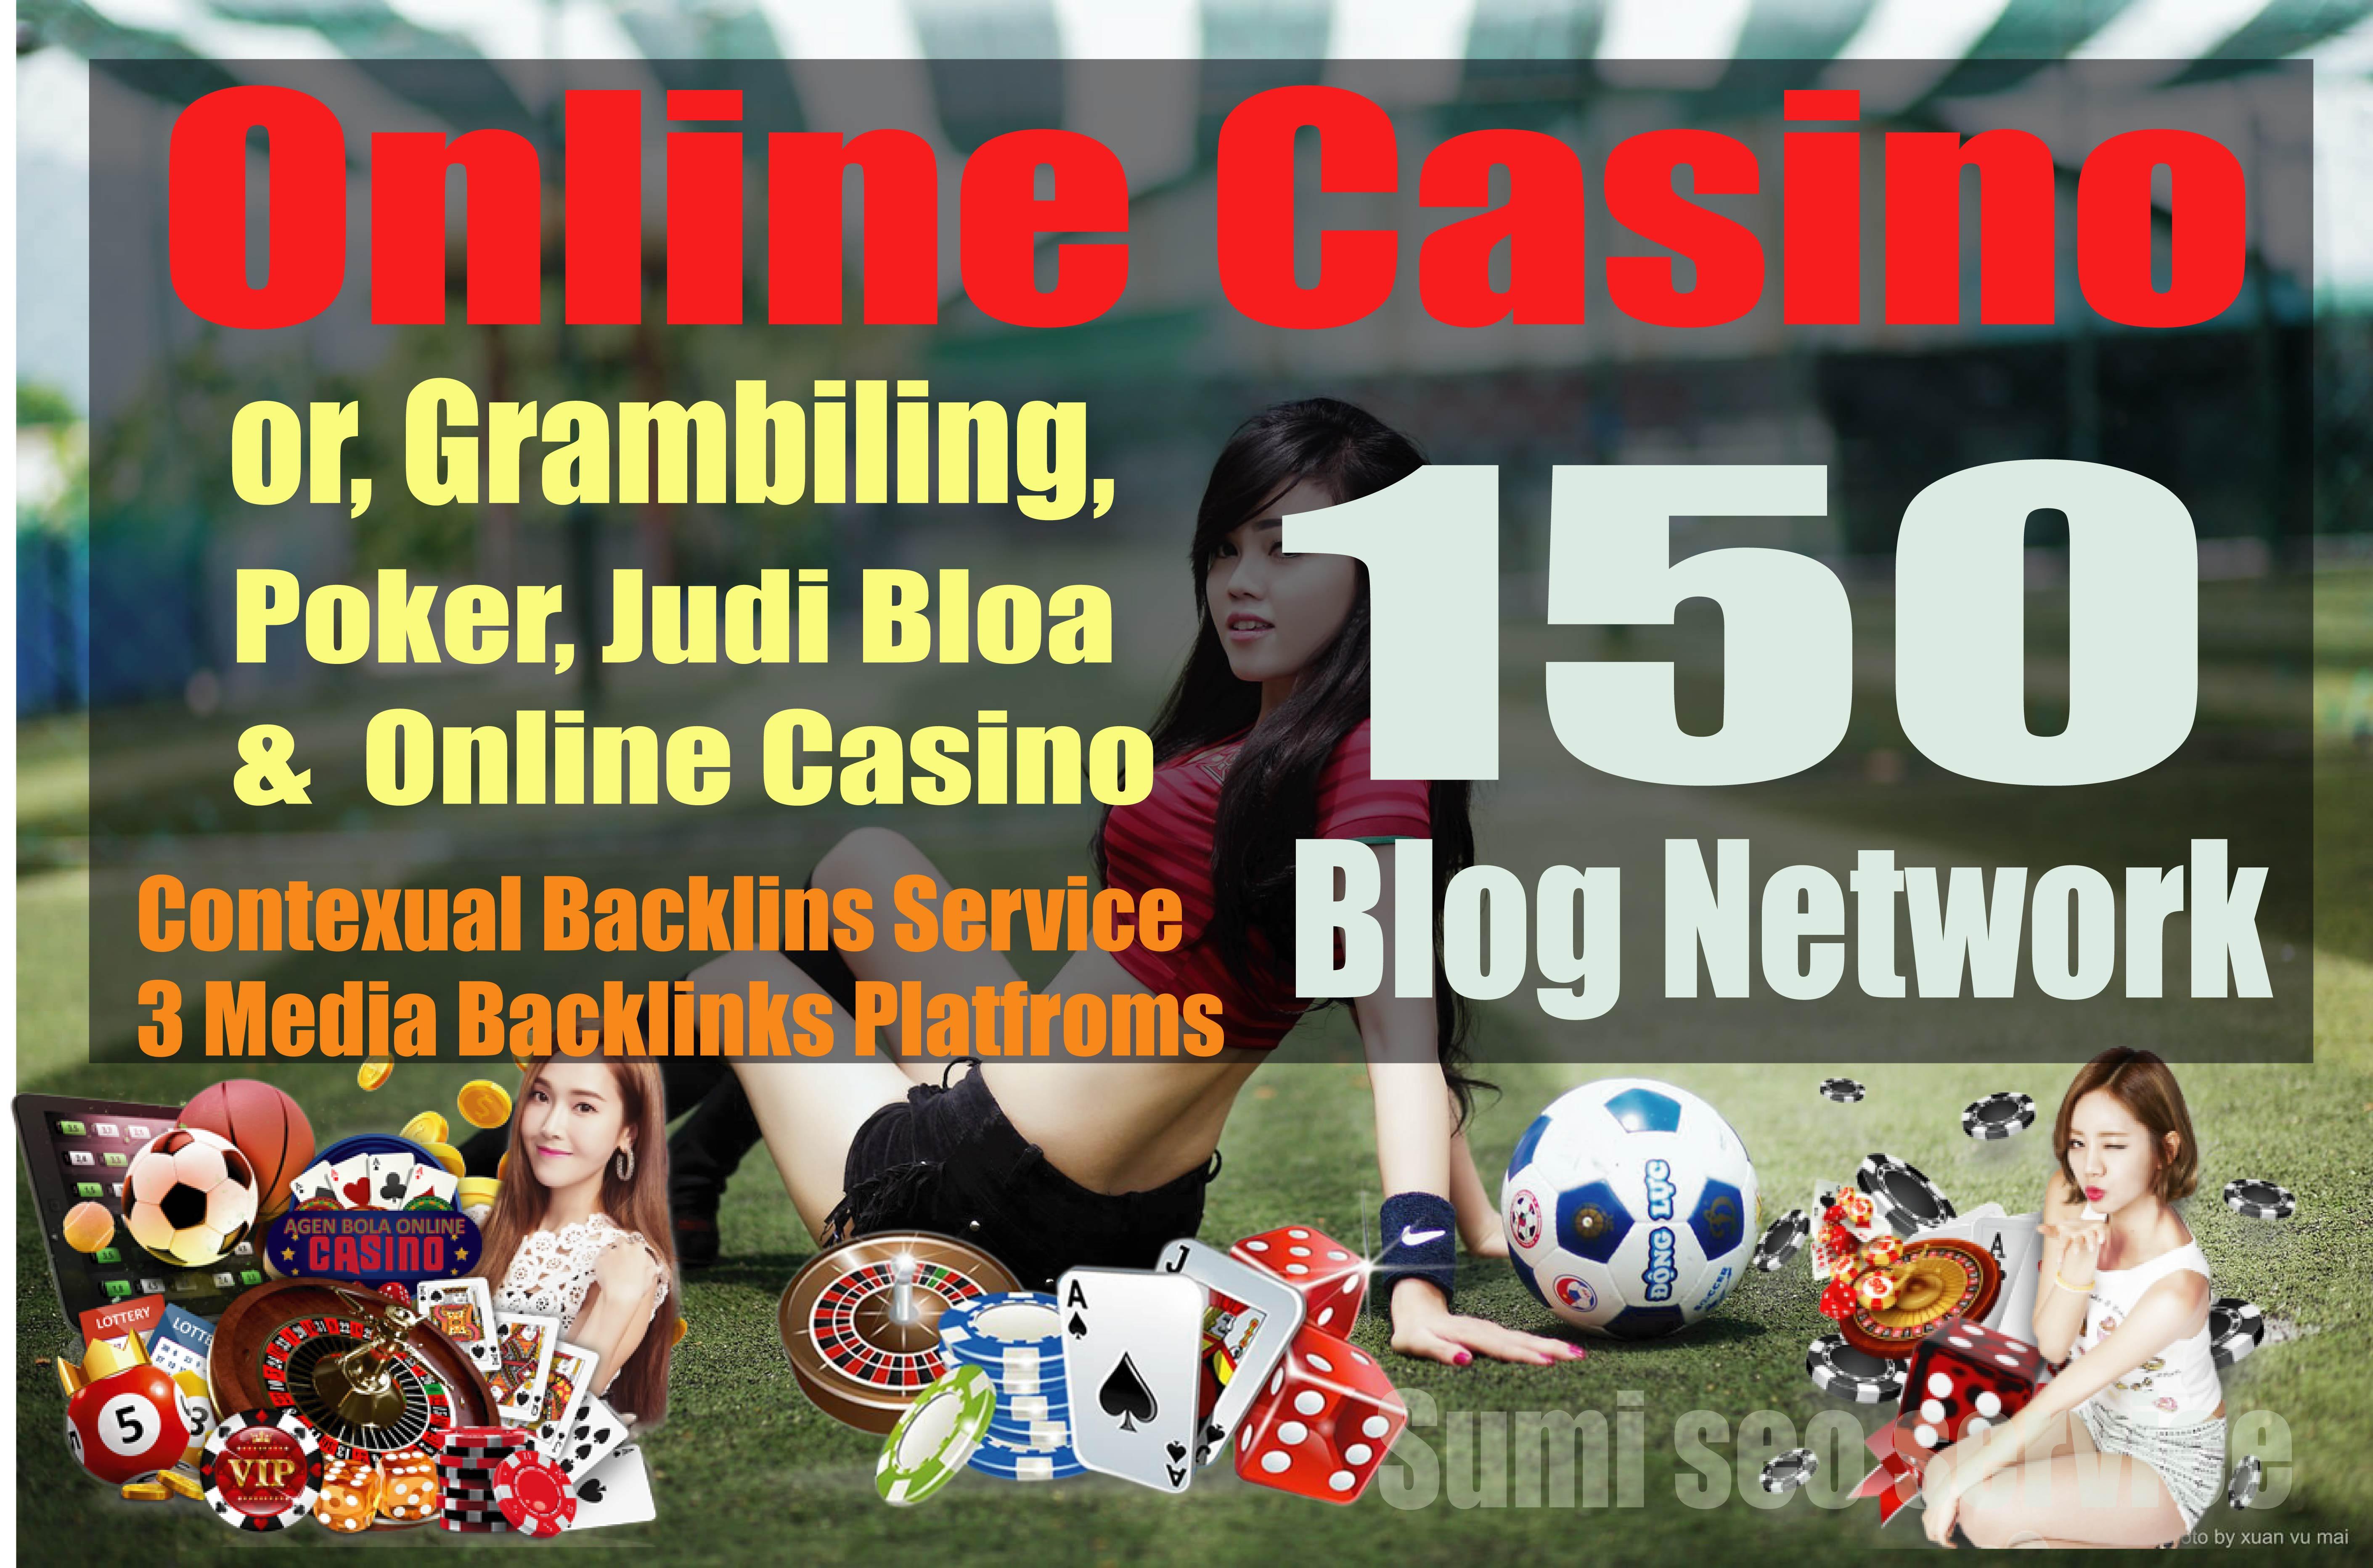 160 Casino Backlinks from Gambling,  Online Casino & Poker web2.0 sites